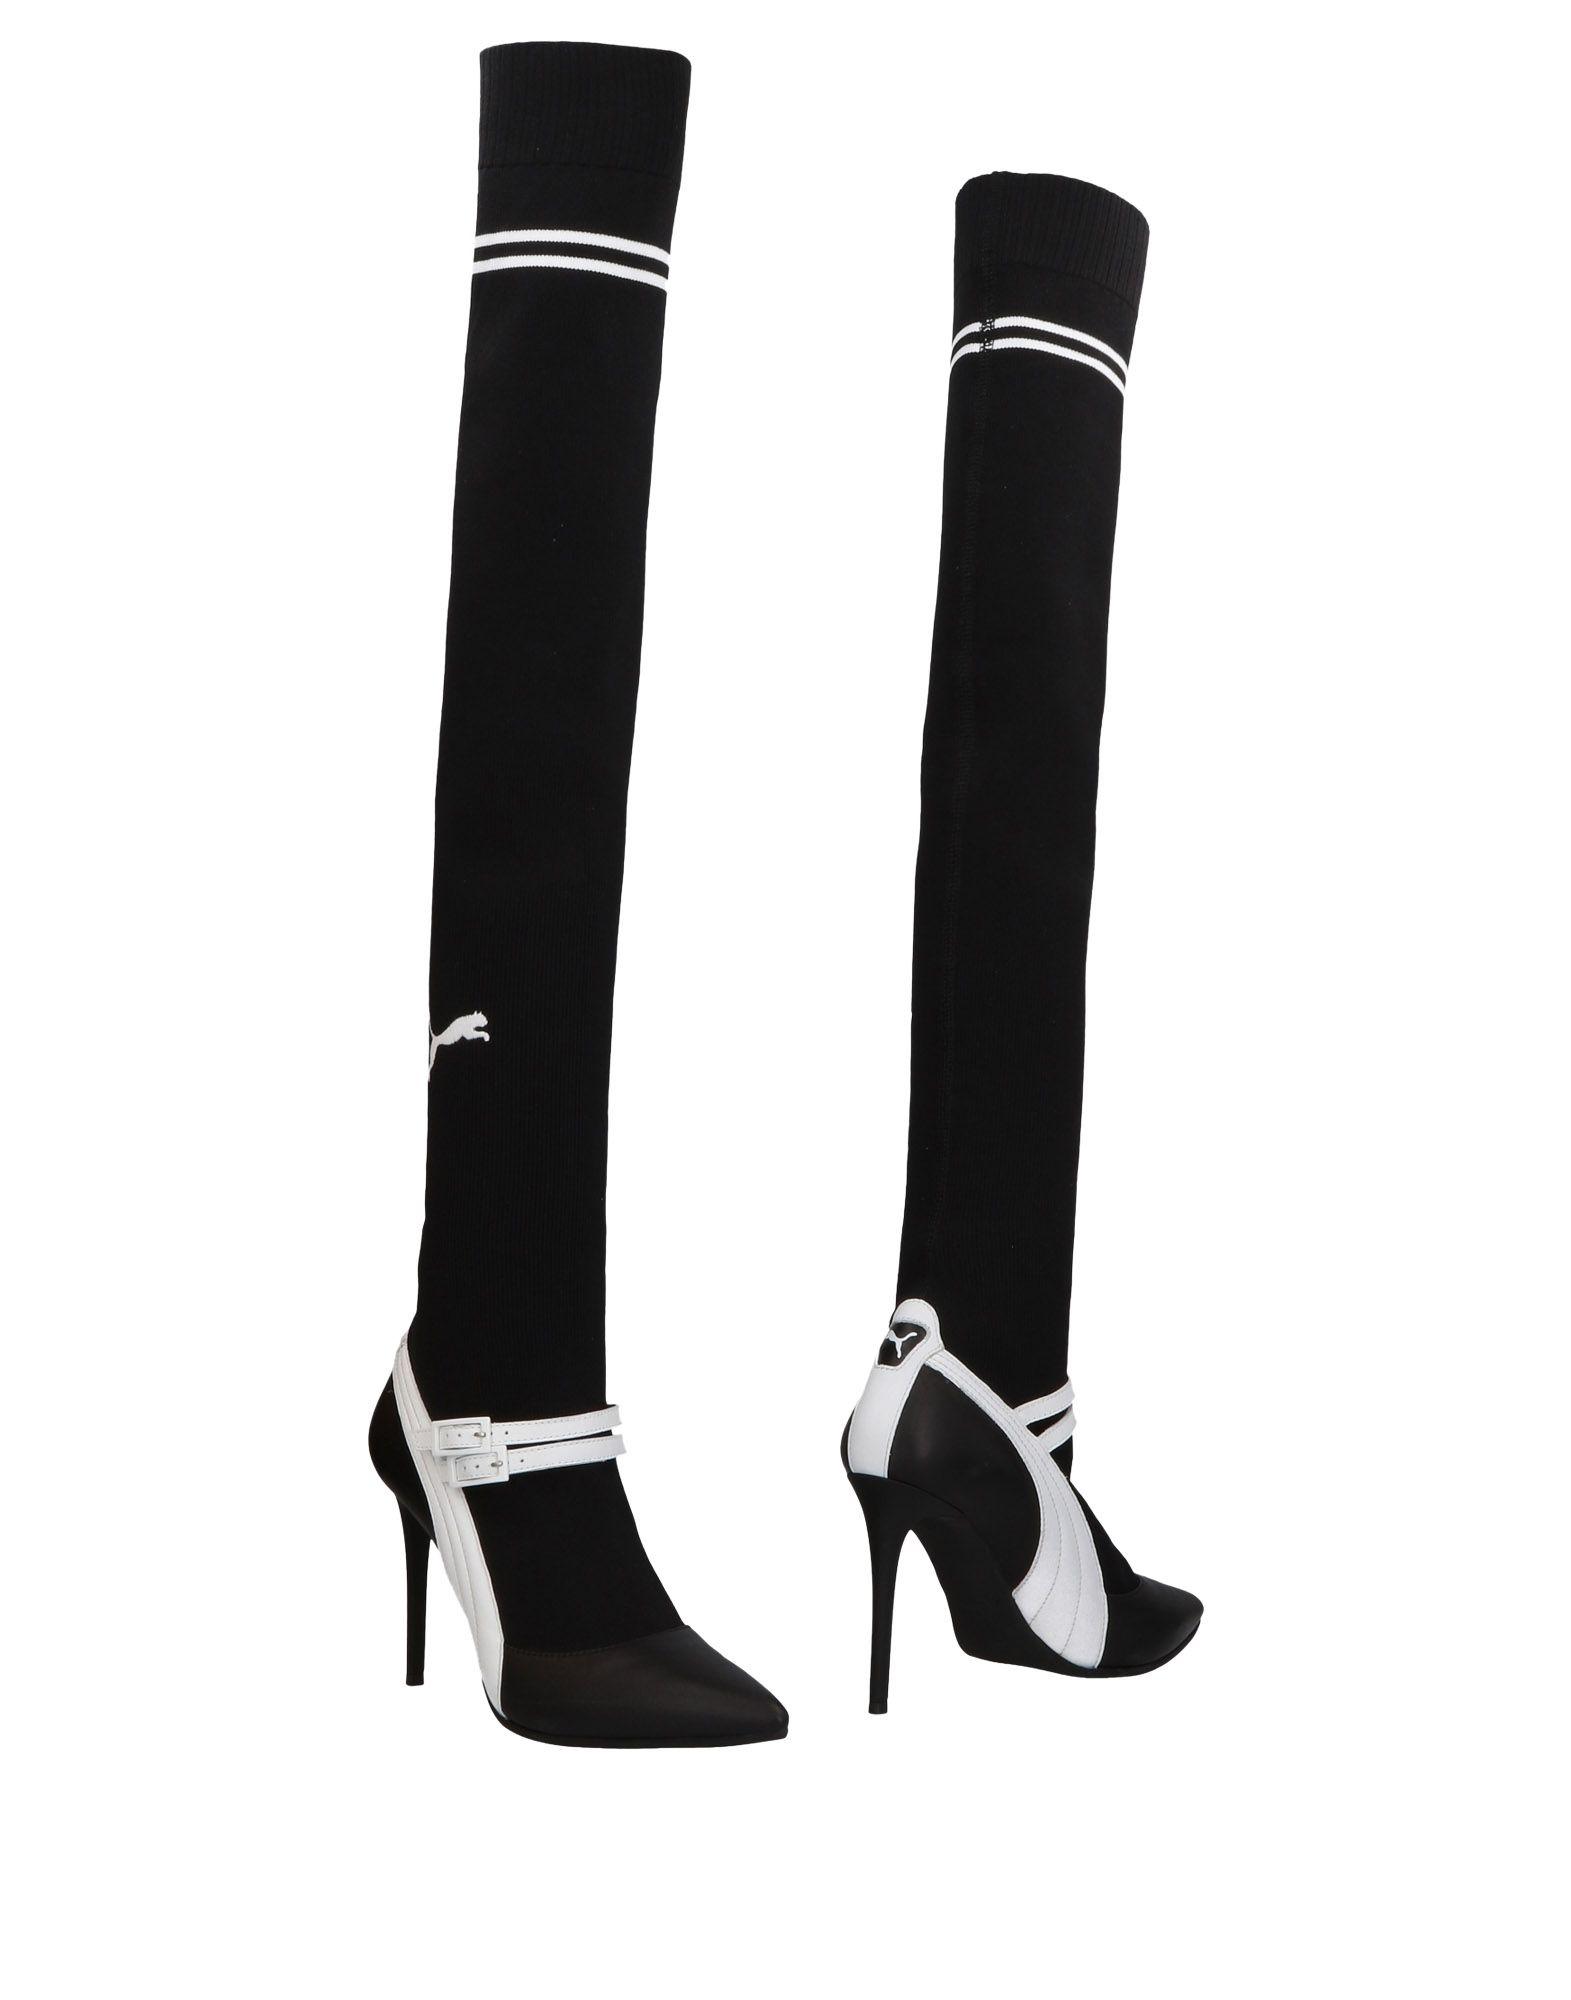 Stivali Fenty Puma By Rihanna Donna - Acquista online su